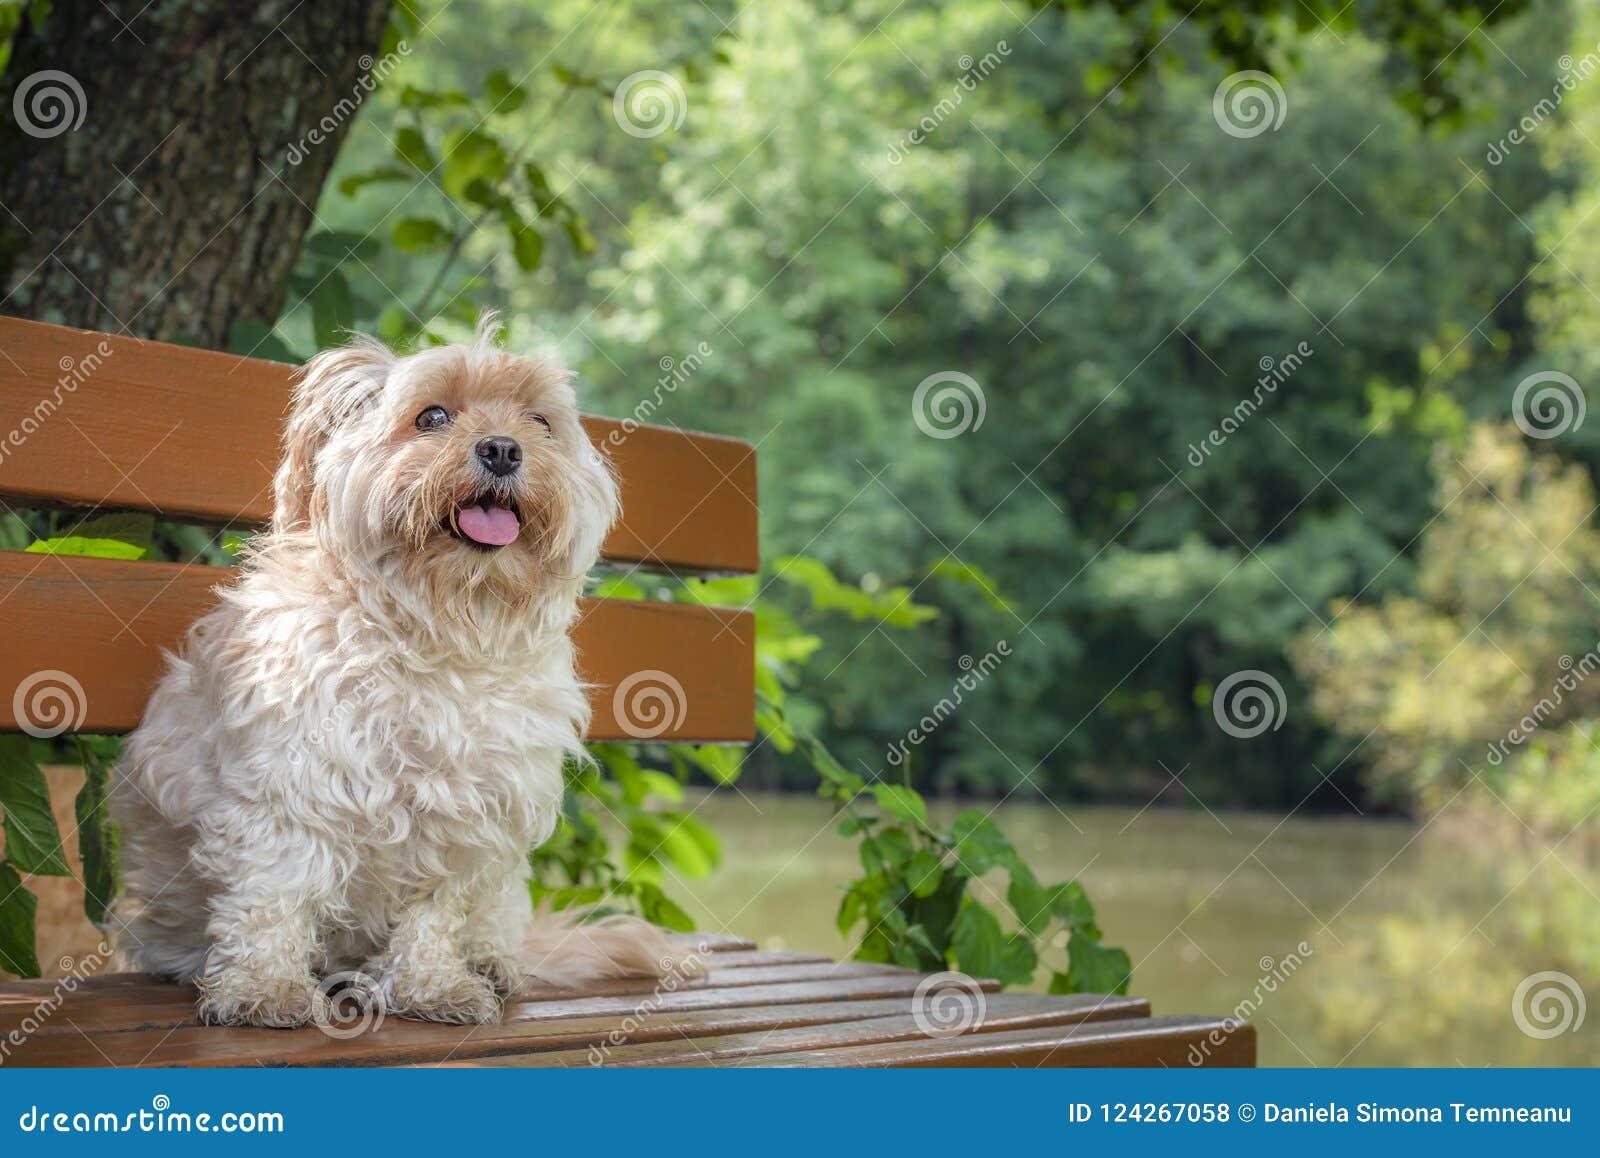 Prime Adorable Small Dog Sitting On A Bench In Nature Stock Photo Frankydiablos Diy Chair Ideas Frankydiabloscom